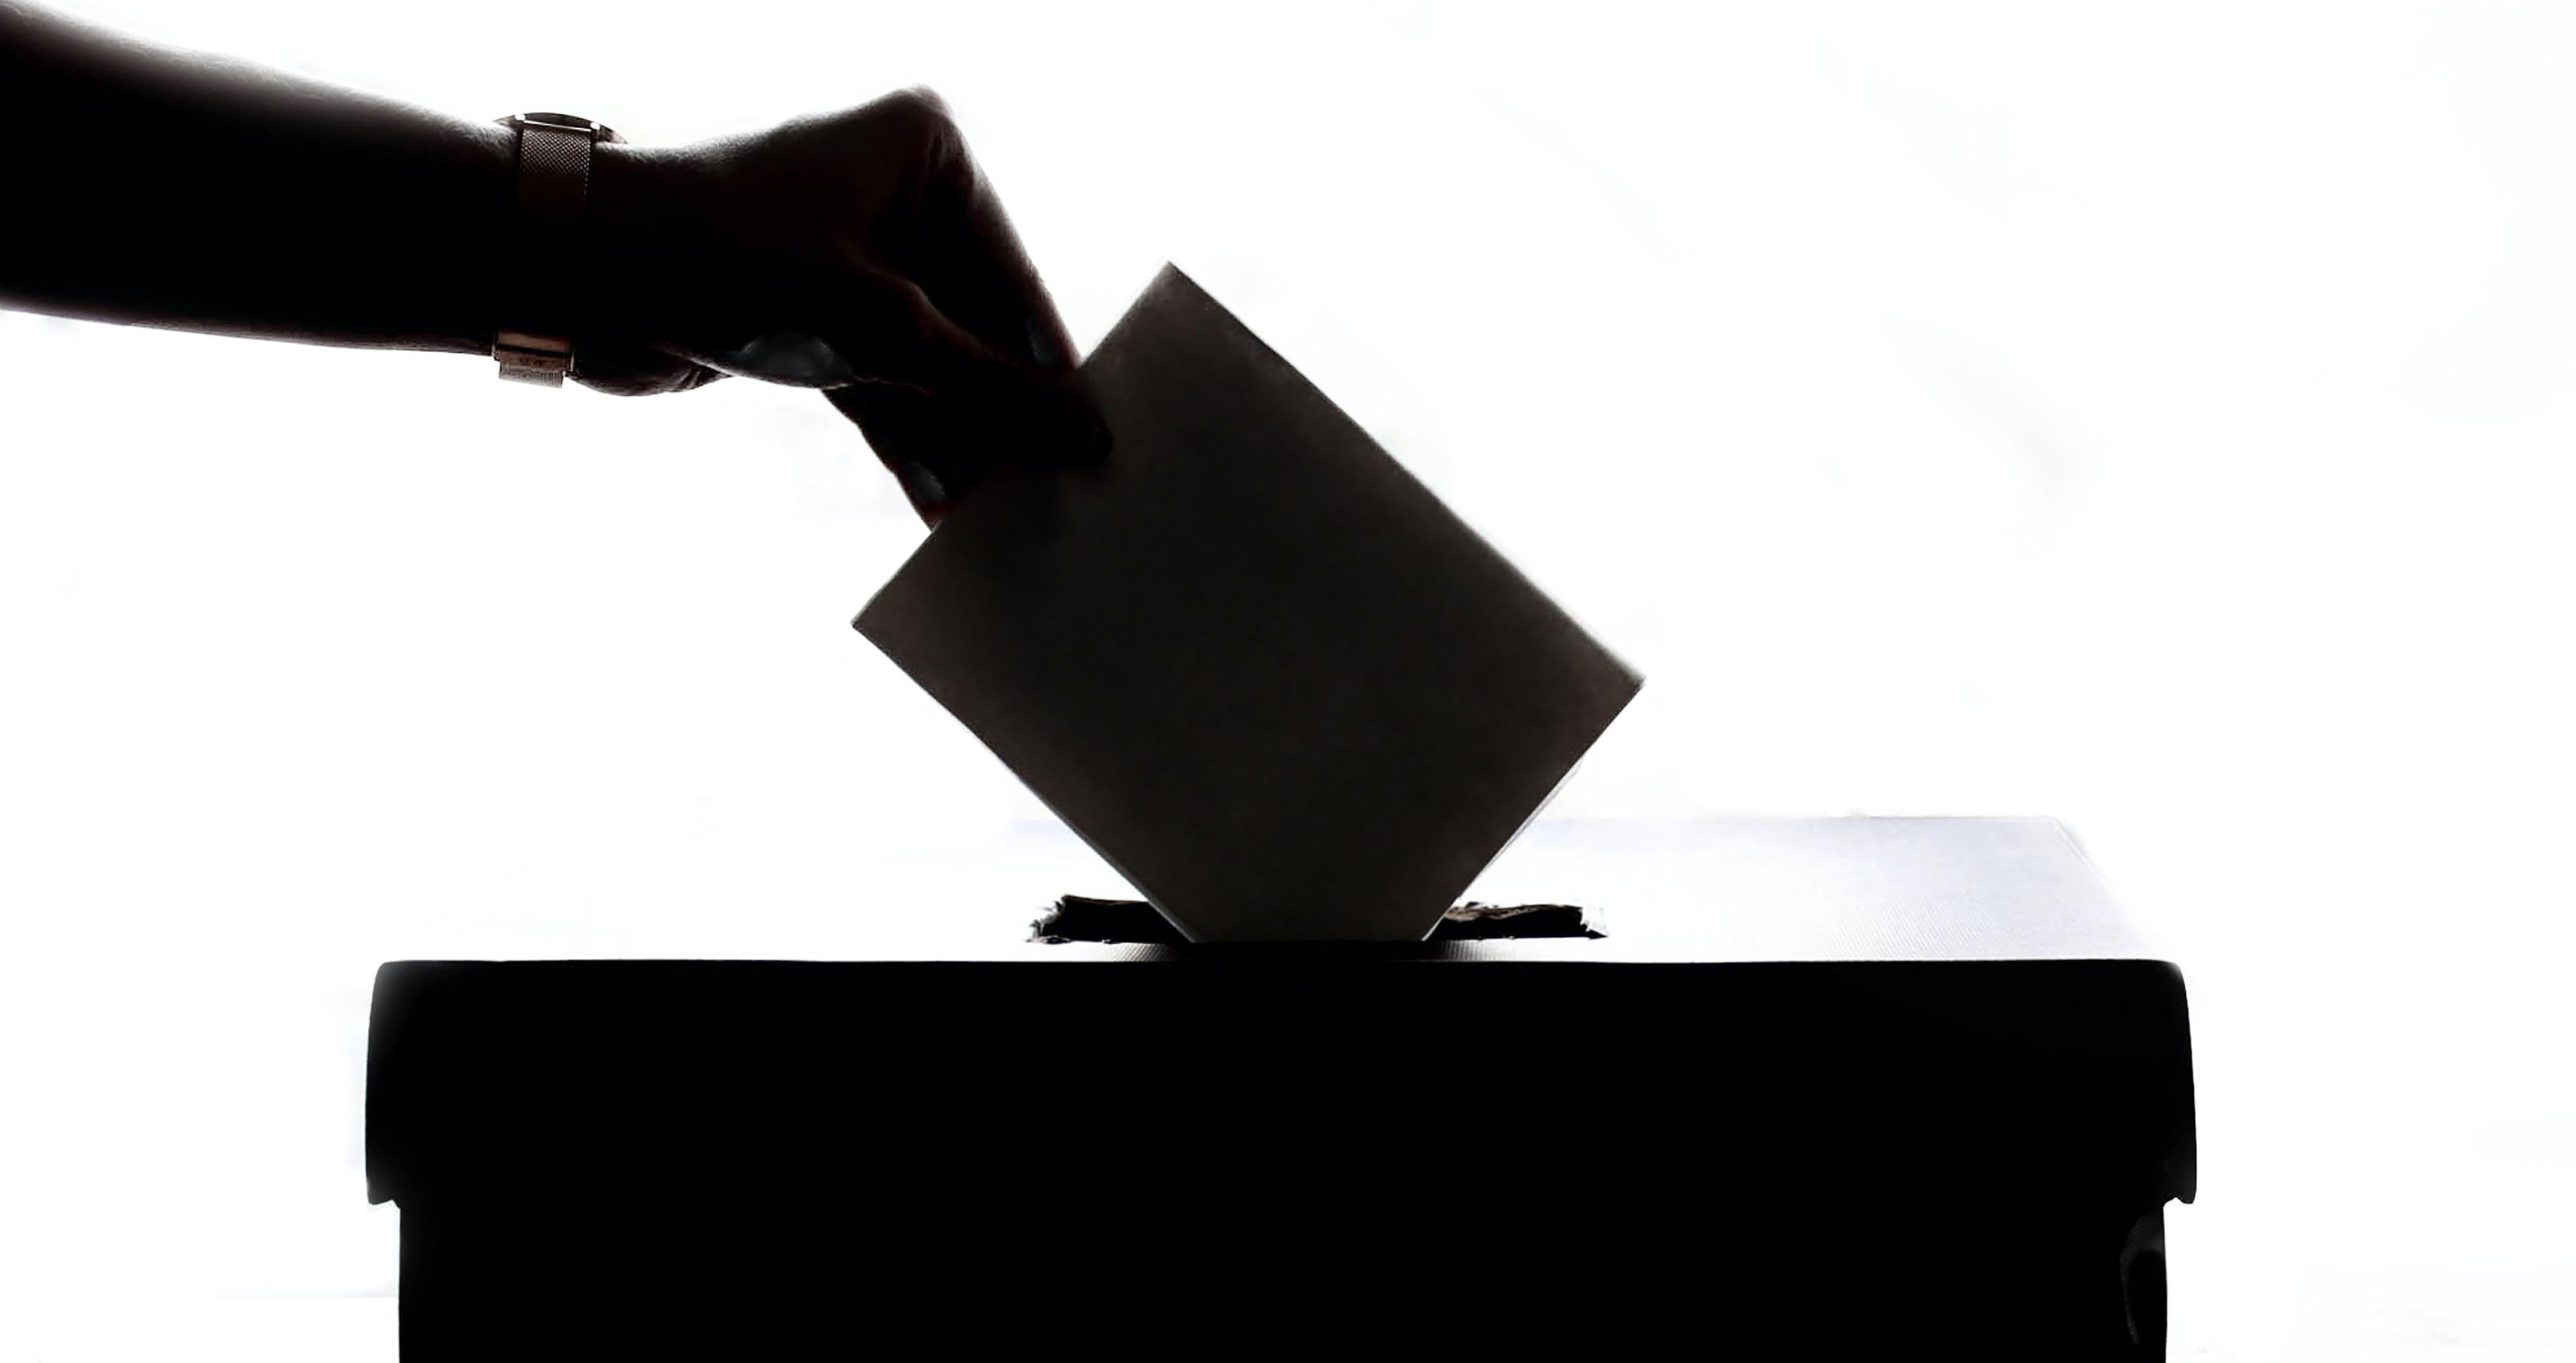 Uravstemning: Nå kan du stemme over forhandlingsresultatet i kommuneoppgjøret